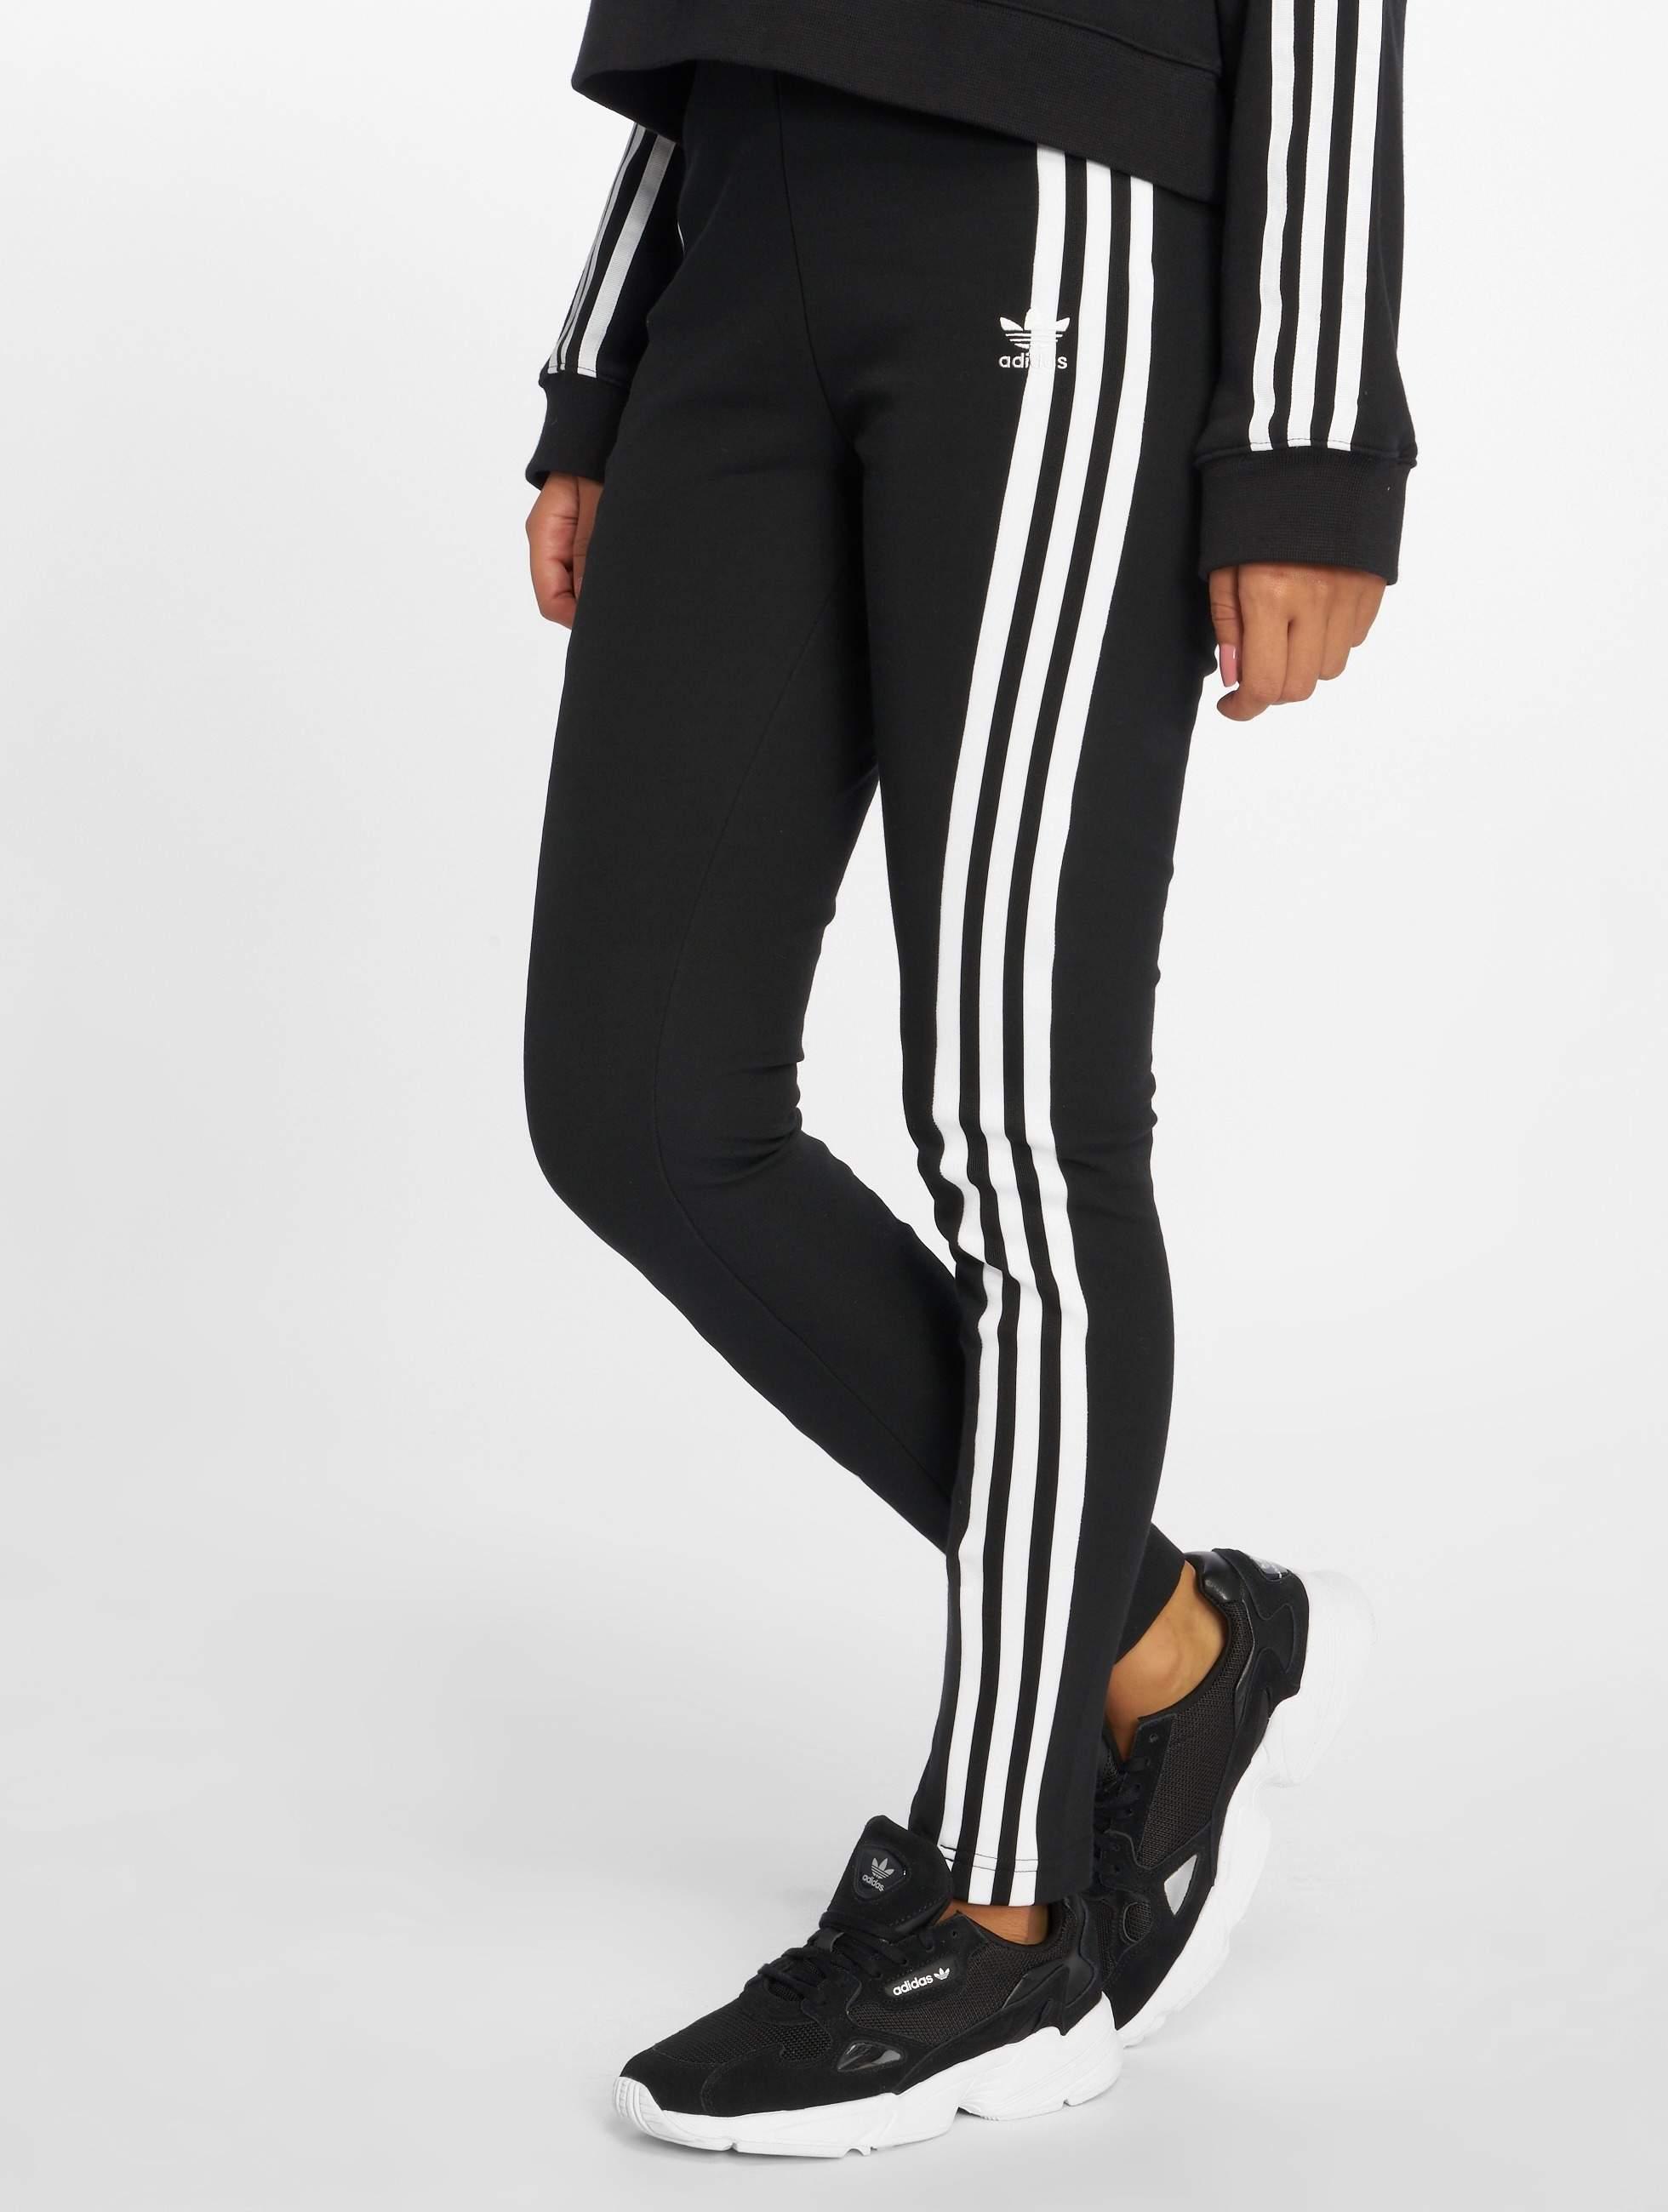 61dae8dbf39 adidas originals broek / joggingbroek Track Pant in zwart 499267